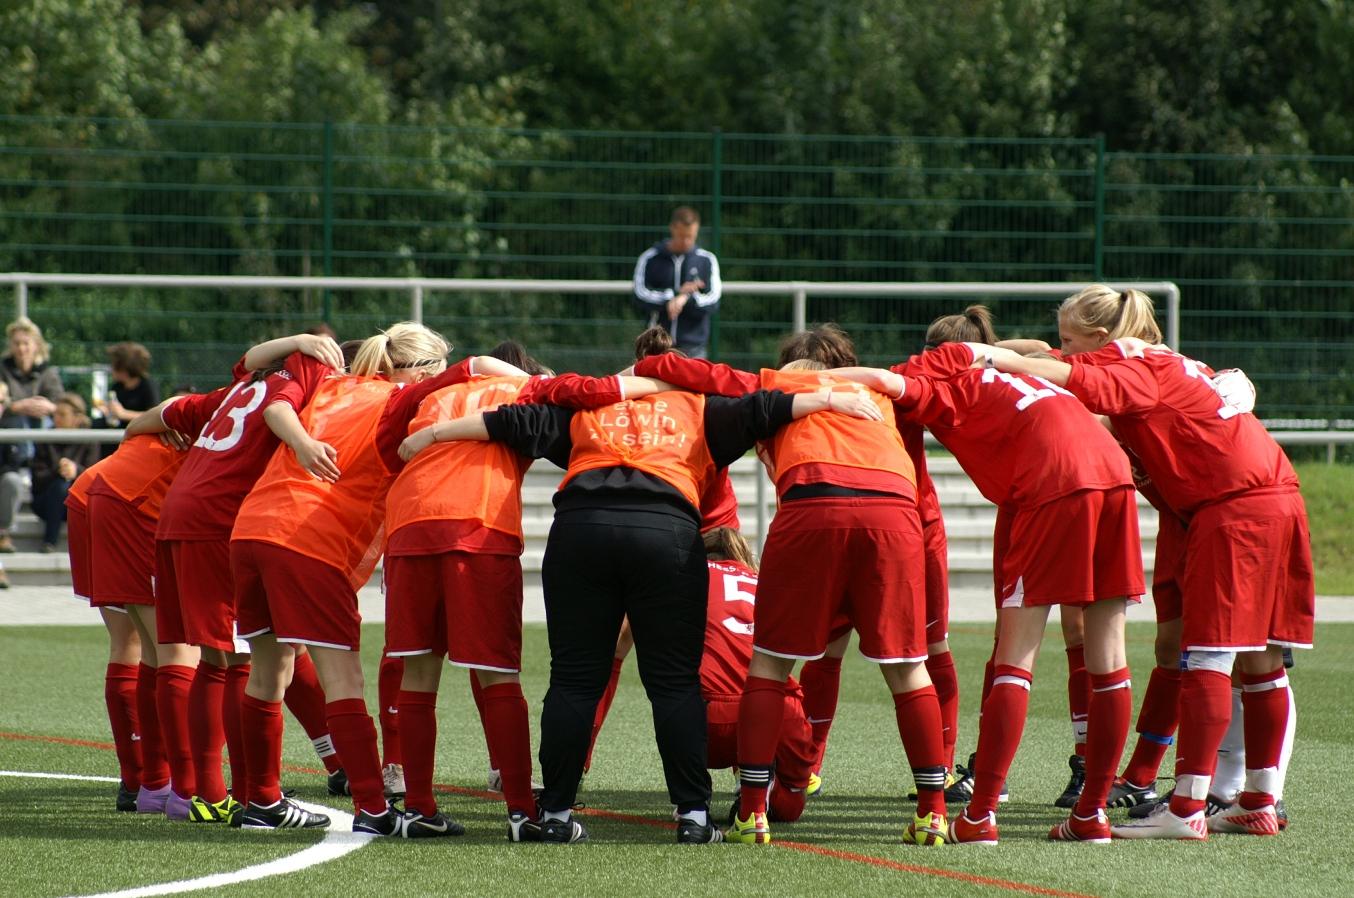 KSV Hessen Kassel B-Juniorinnen - 1. FFC Runkel: Mannschaftskreis vor Anpfiff